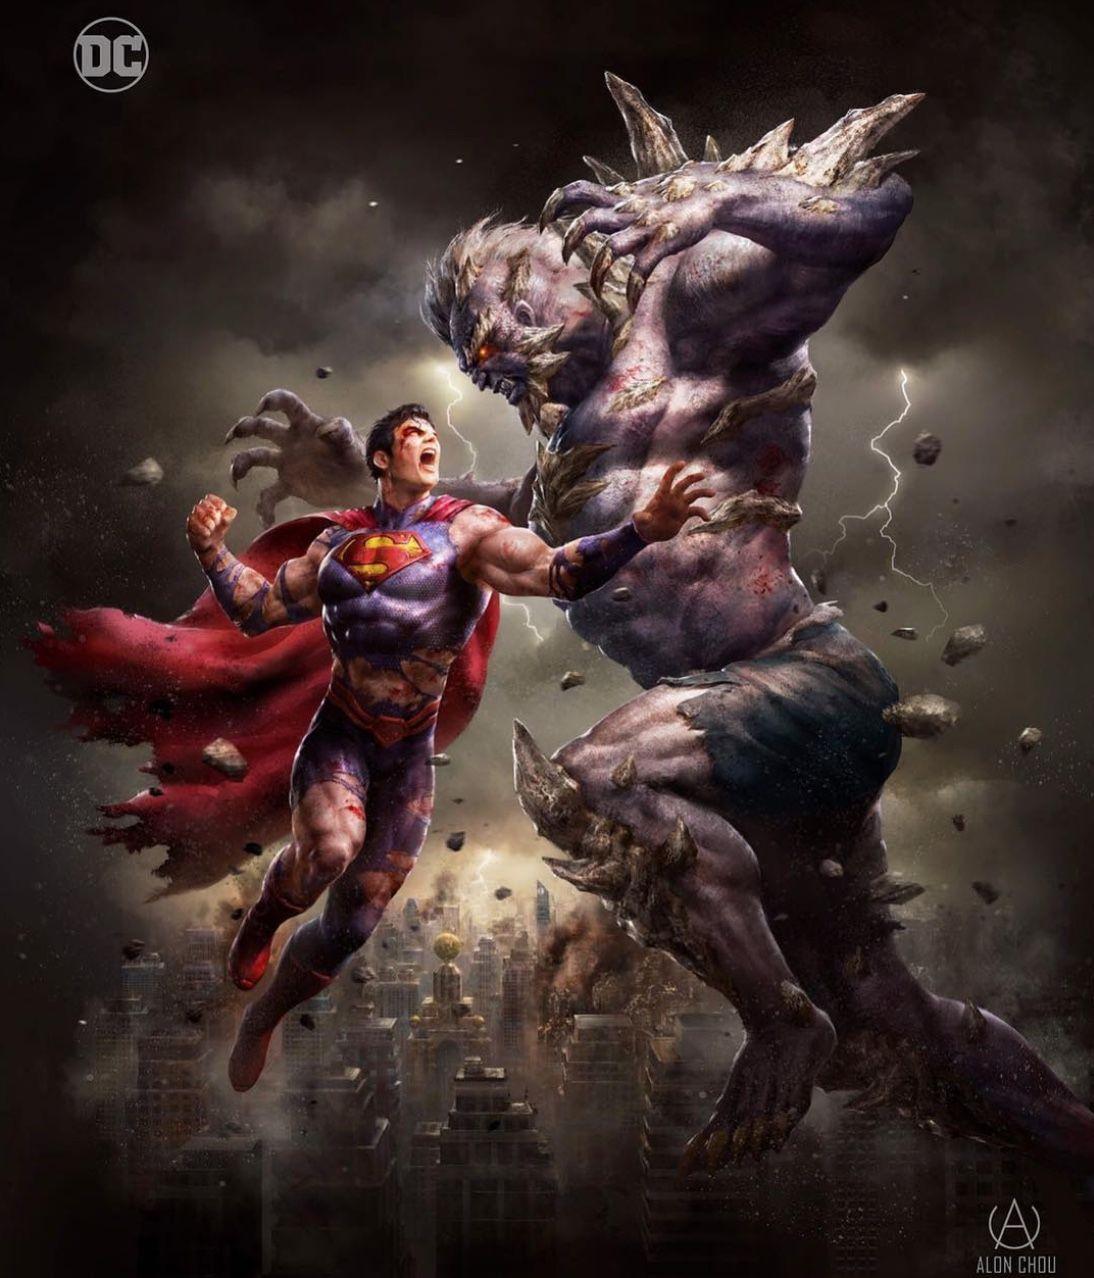 Dc comics comic book artwork superman vs doomsday by